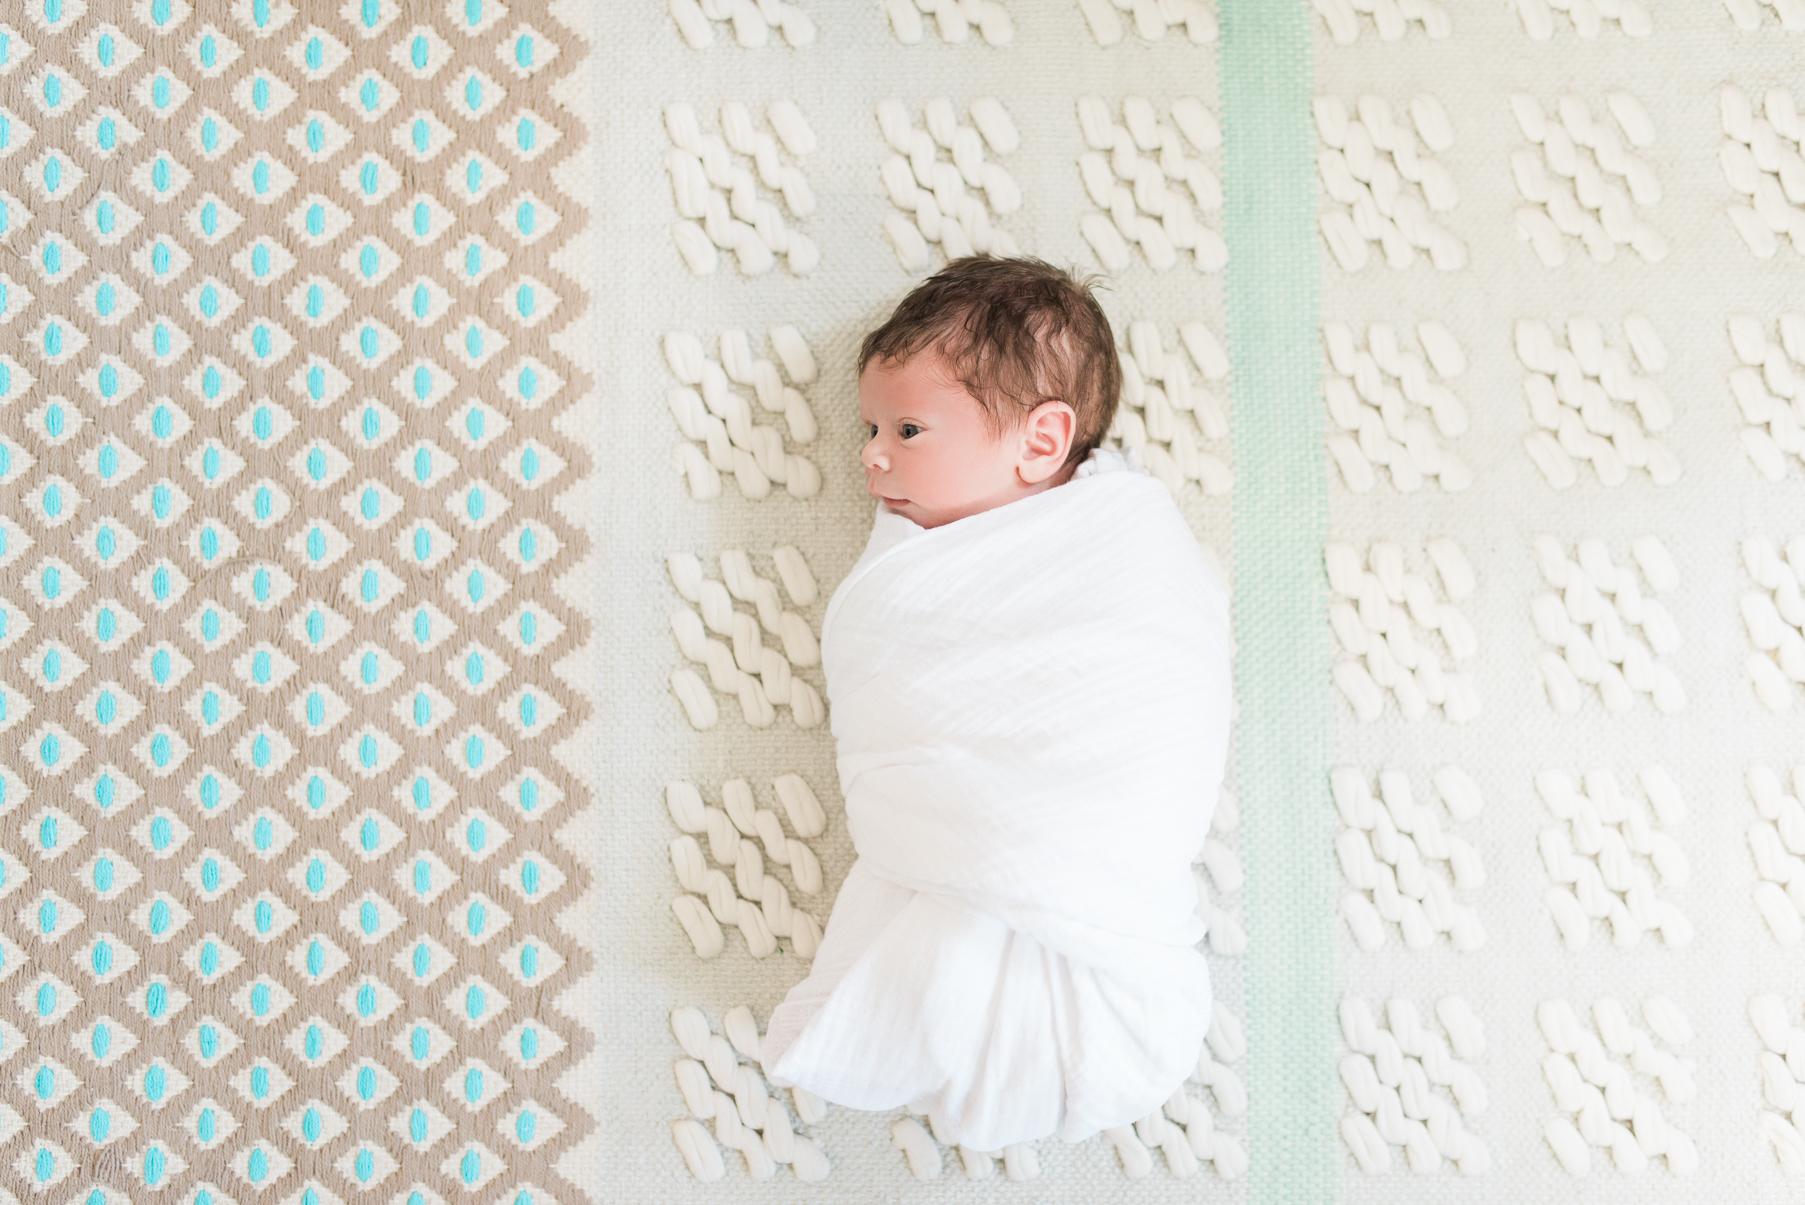 Baltimore-Maryland-Harford-County-Newborn-Photographer-Lifestyle-Breanna-Kuhlmann-3.jpg